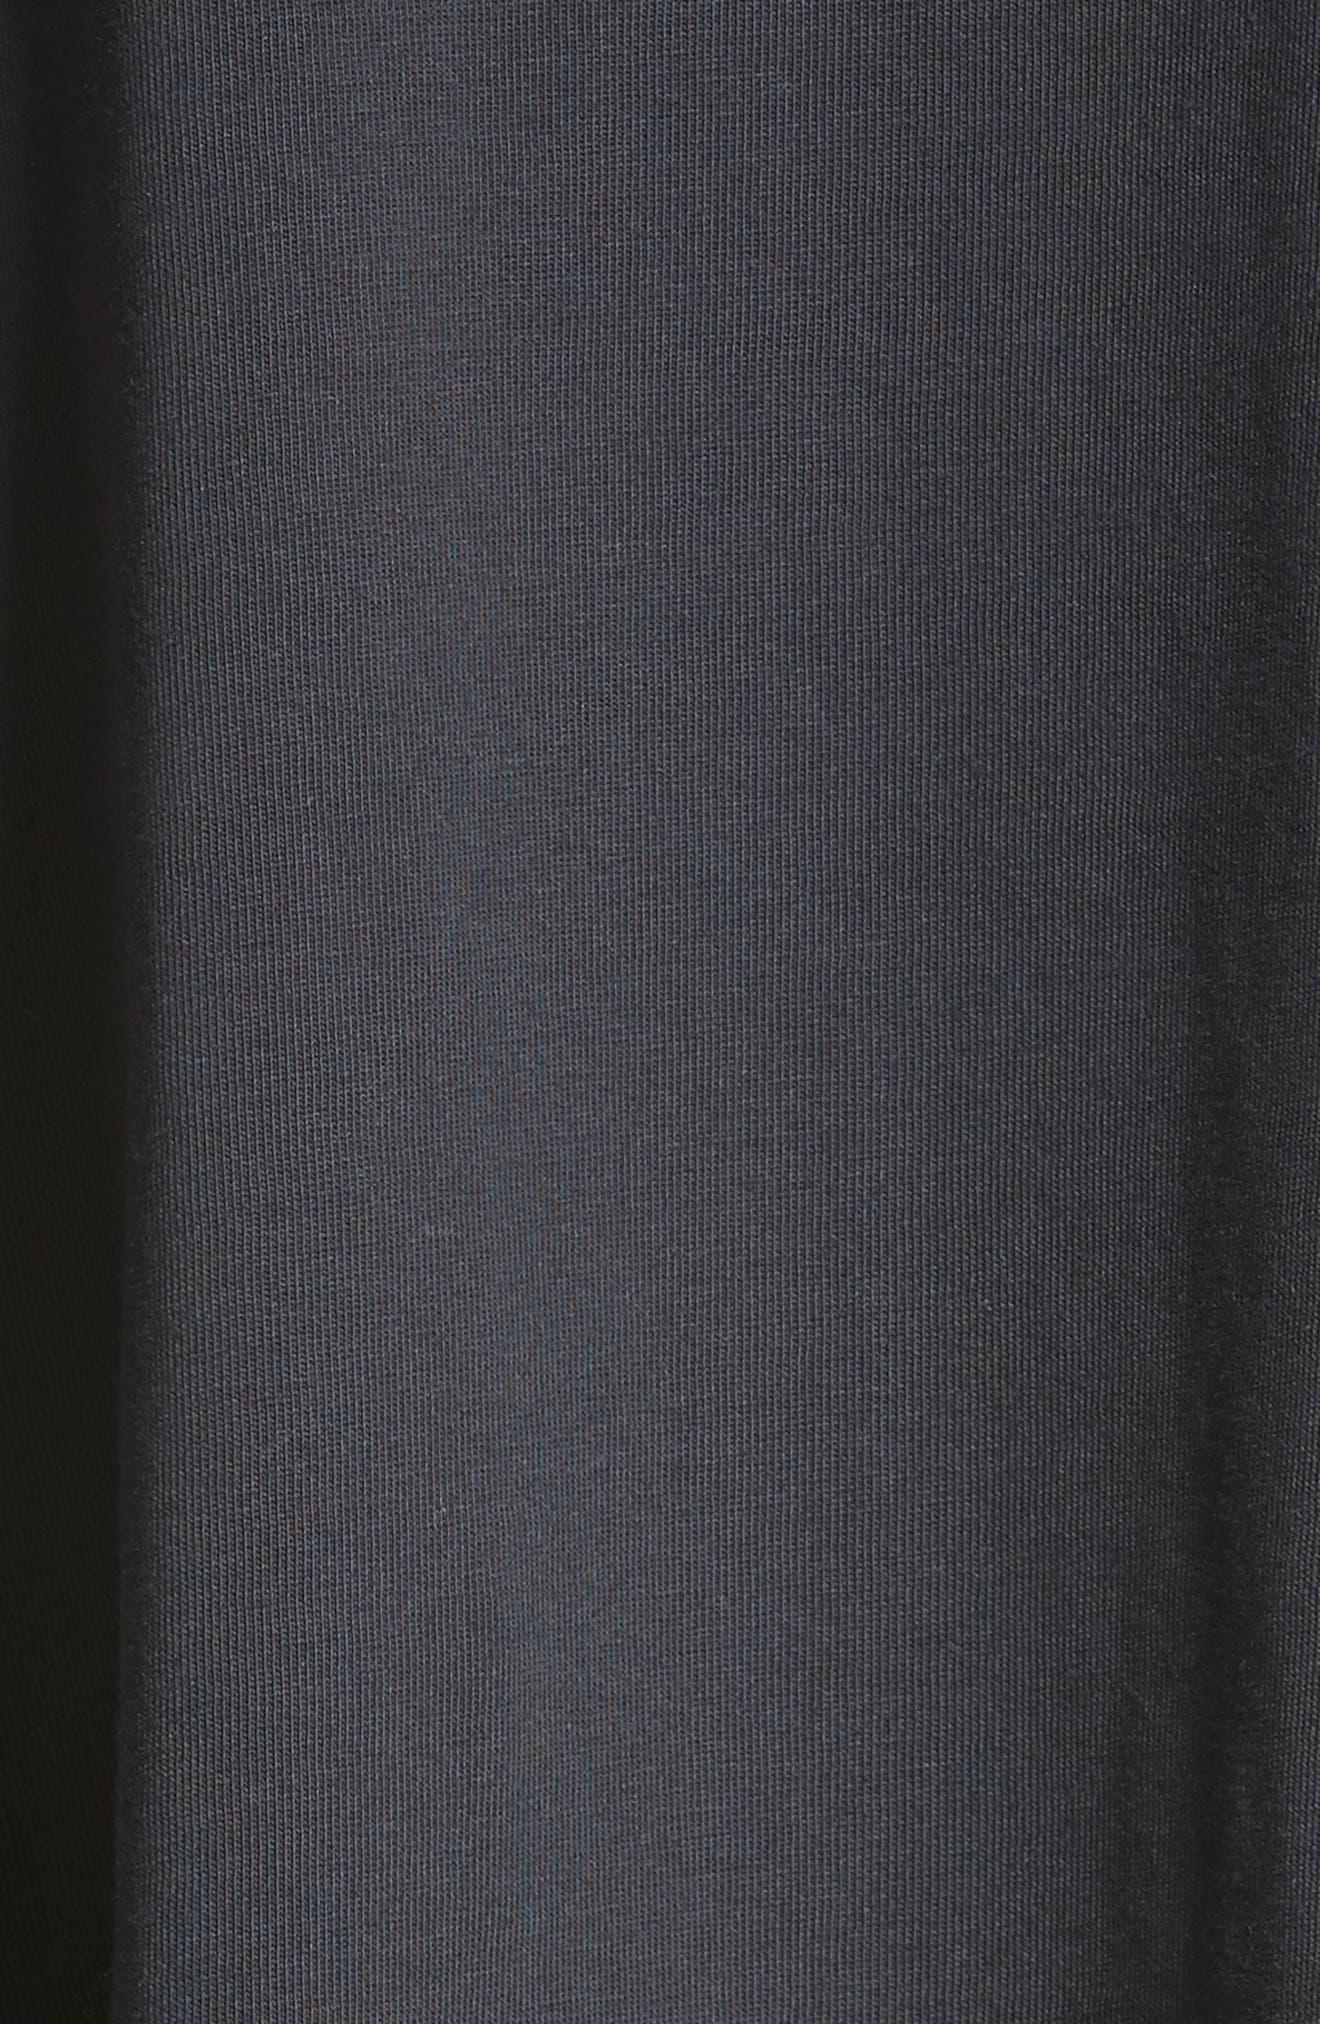 Alternate Image 3  - Vetements x Champion In Progress Dress